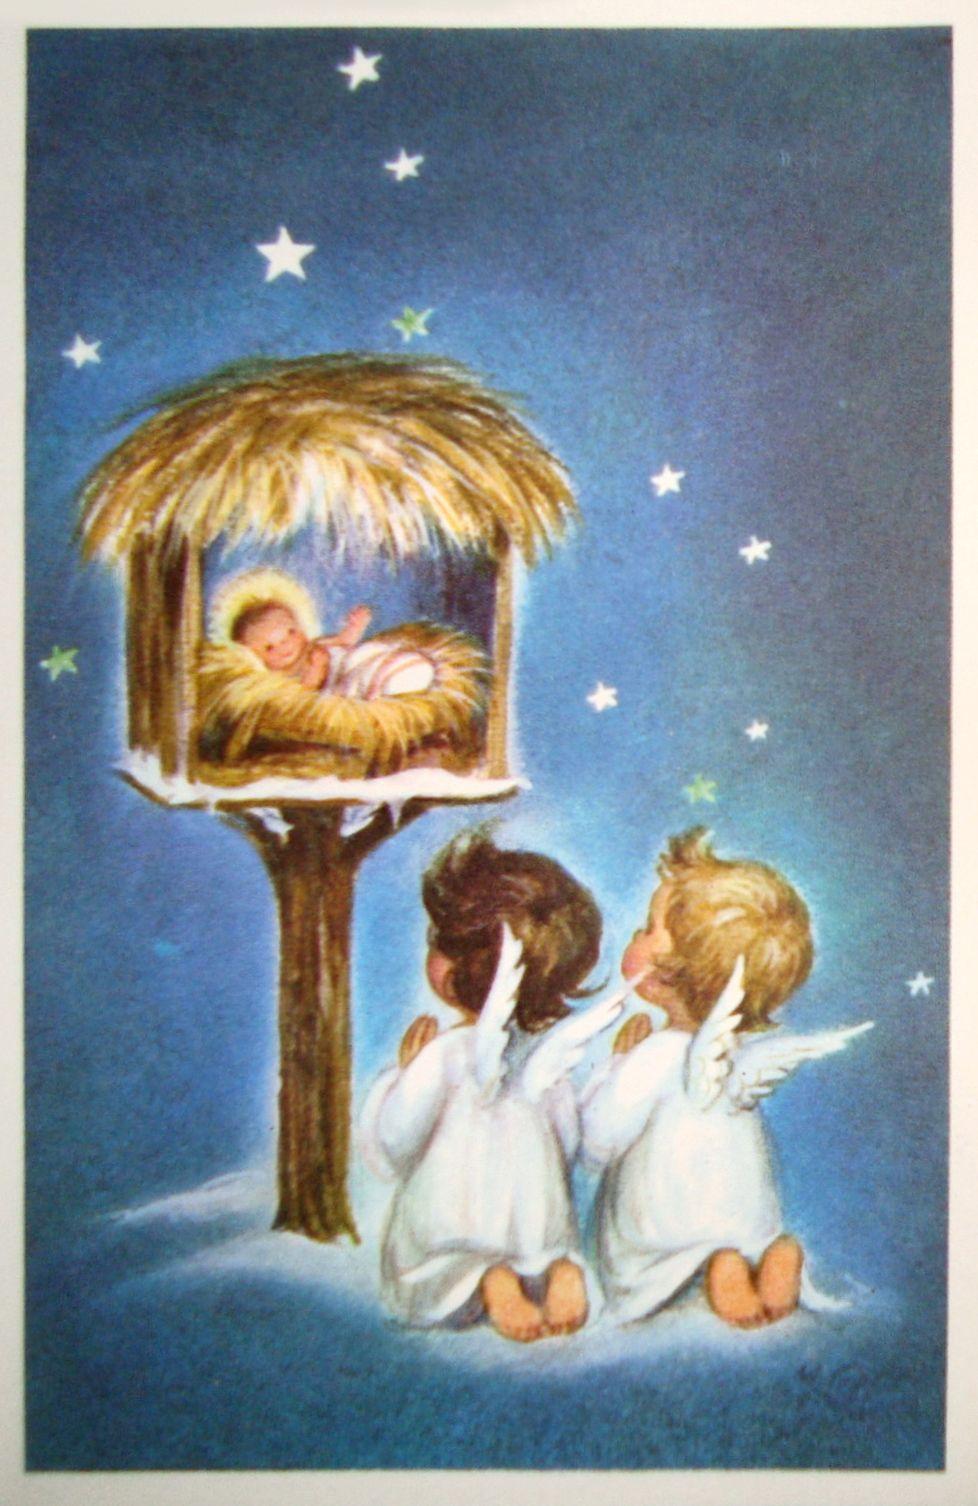 Vintage Christmas Card Christmas Graphics 2 Nativity Pinterest